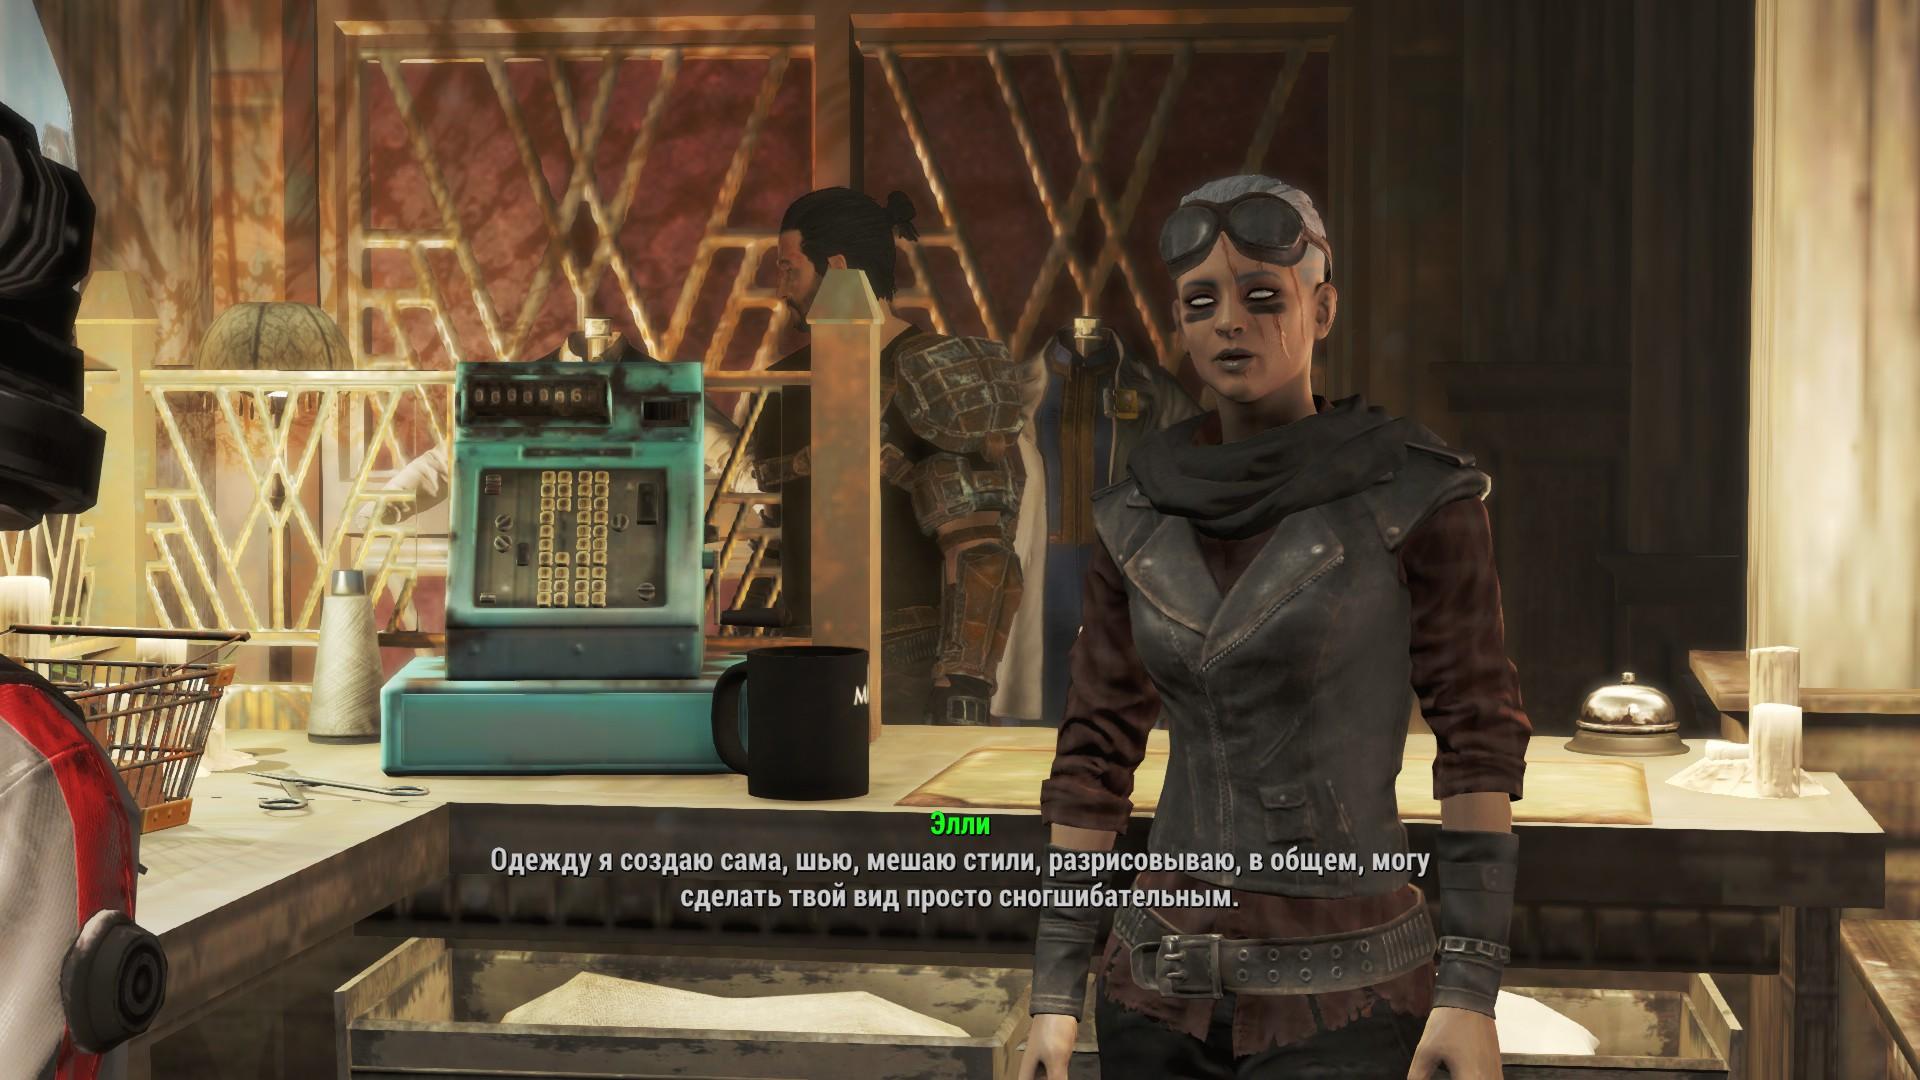 20170930115554_1.jpg - Fallout 4